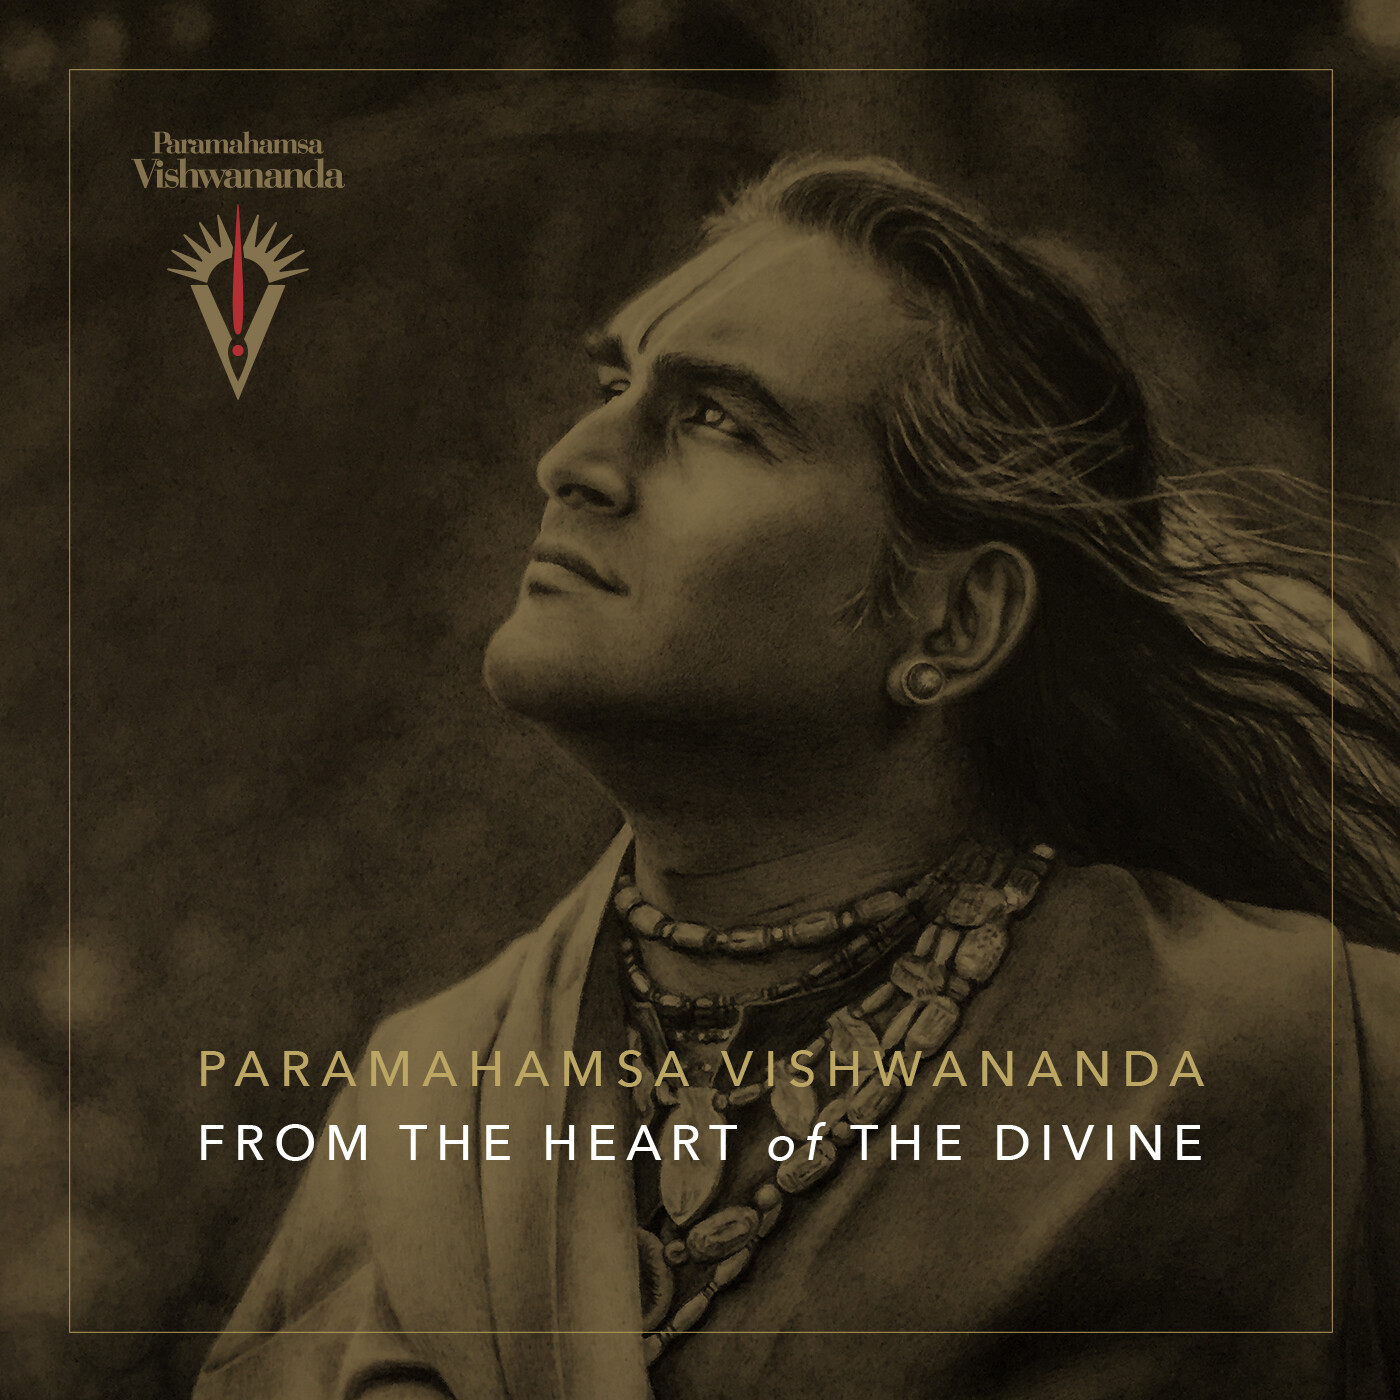 From the Heart of the Divine - Paramahamsa Vishwananda